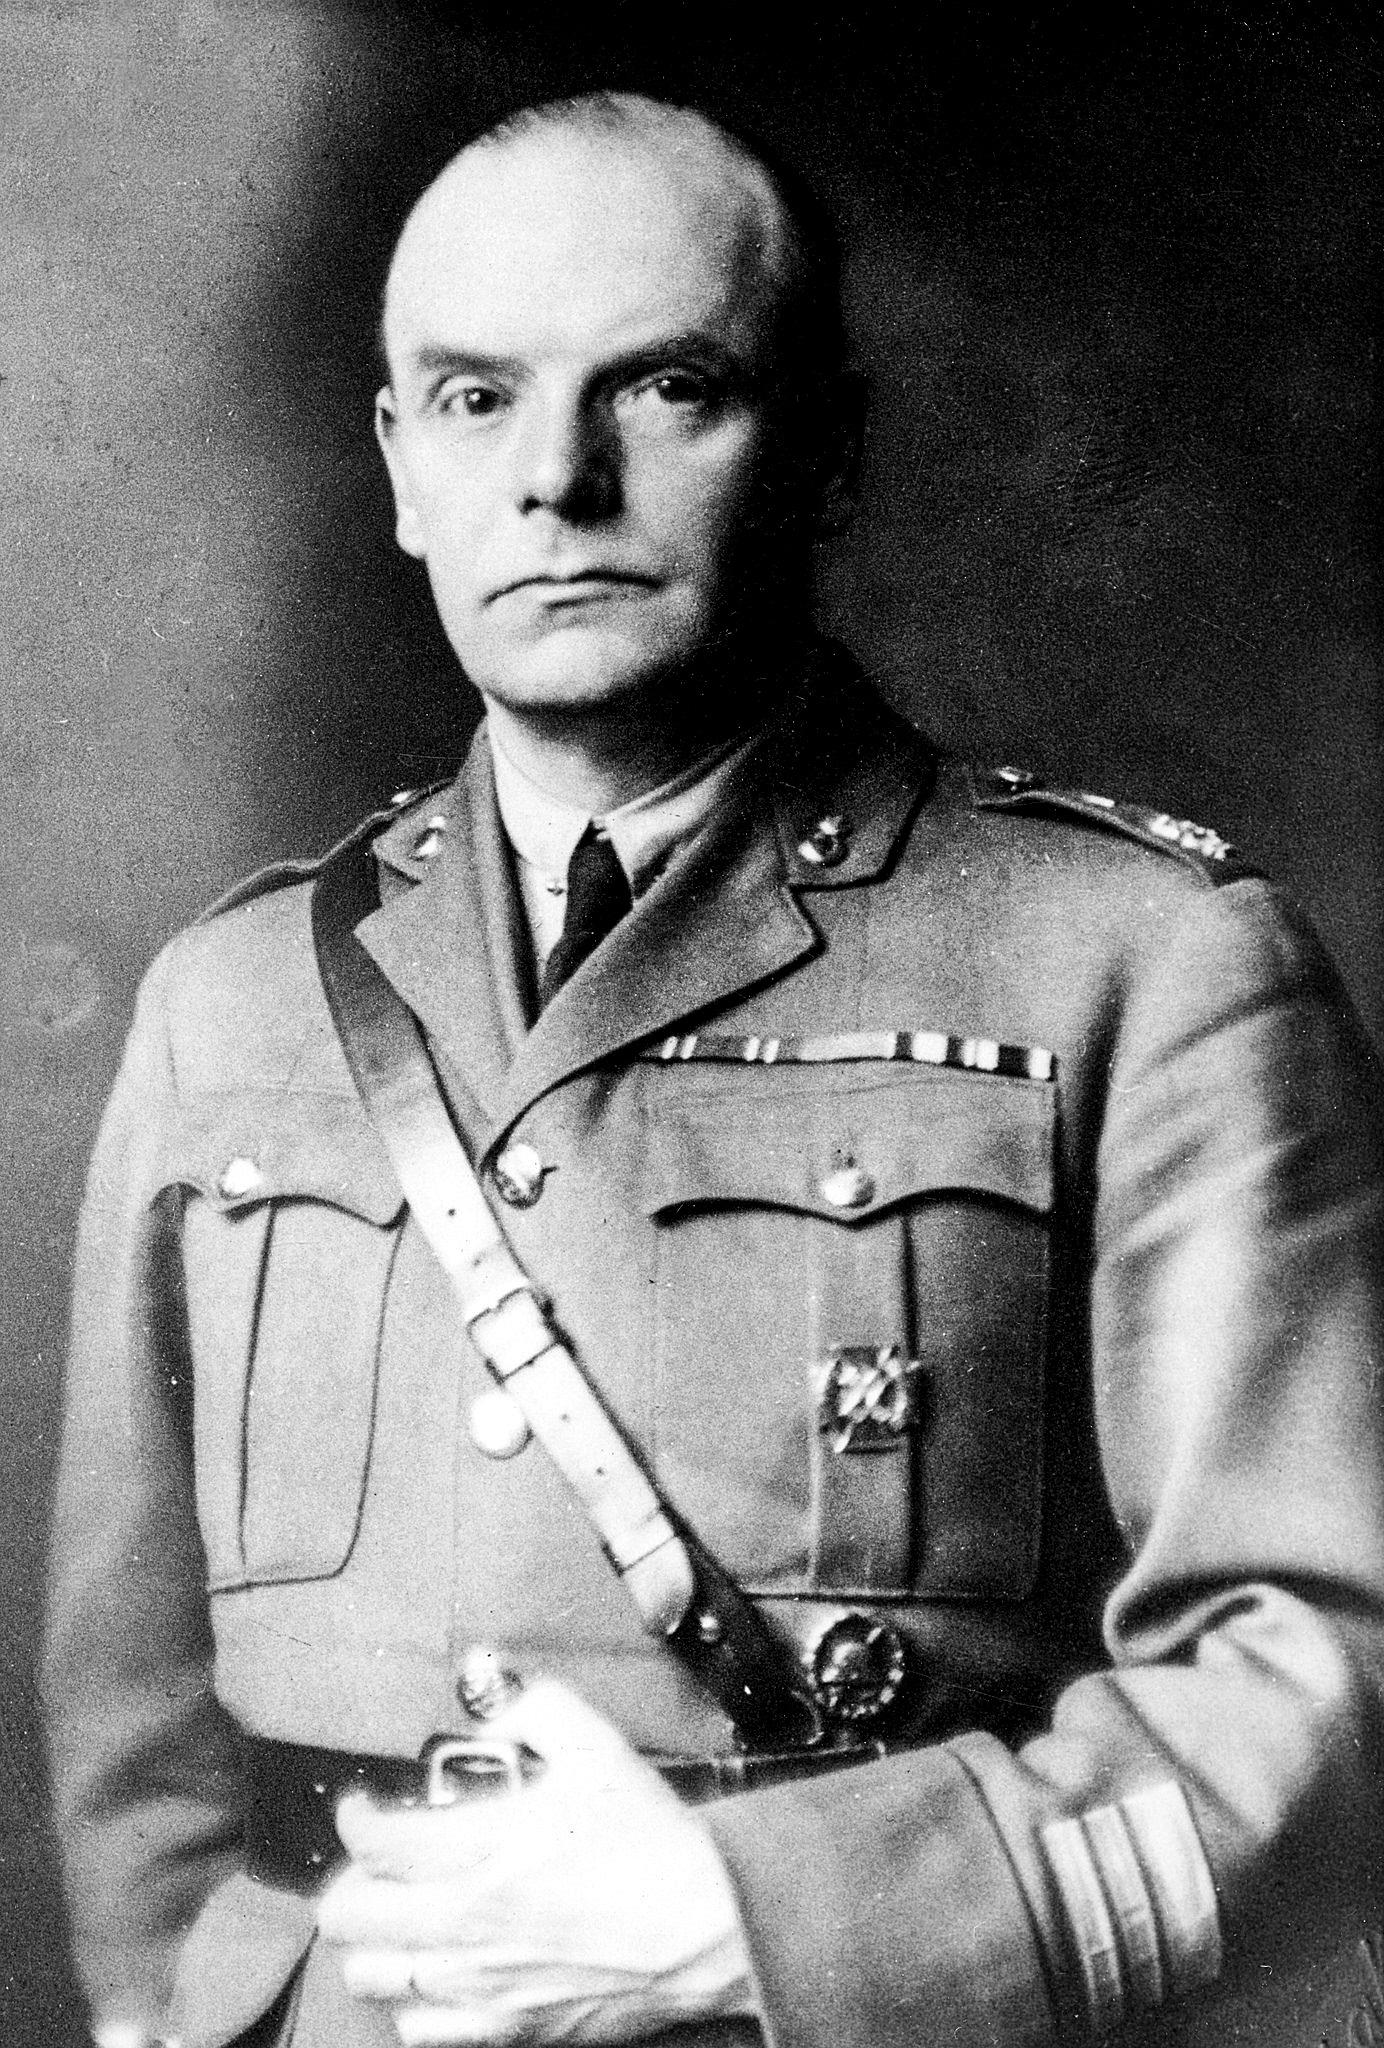 Kompanichef Gunnar Melin. Foto från Museokeskus Vapriikki.